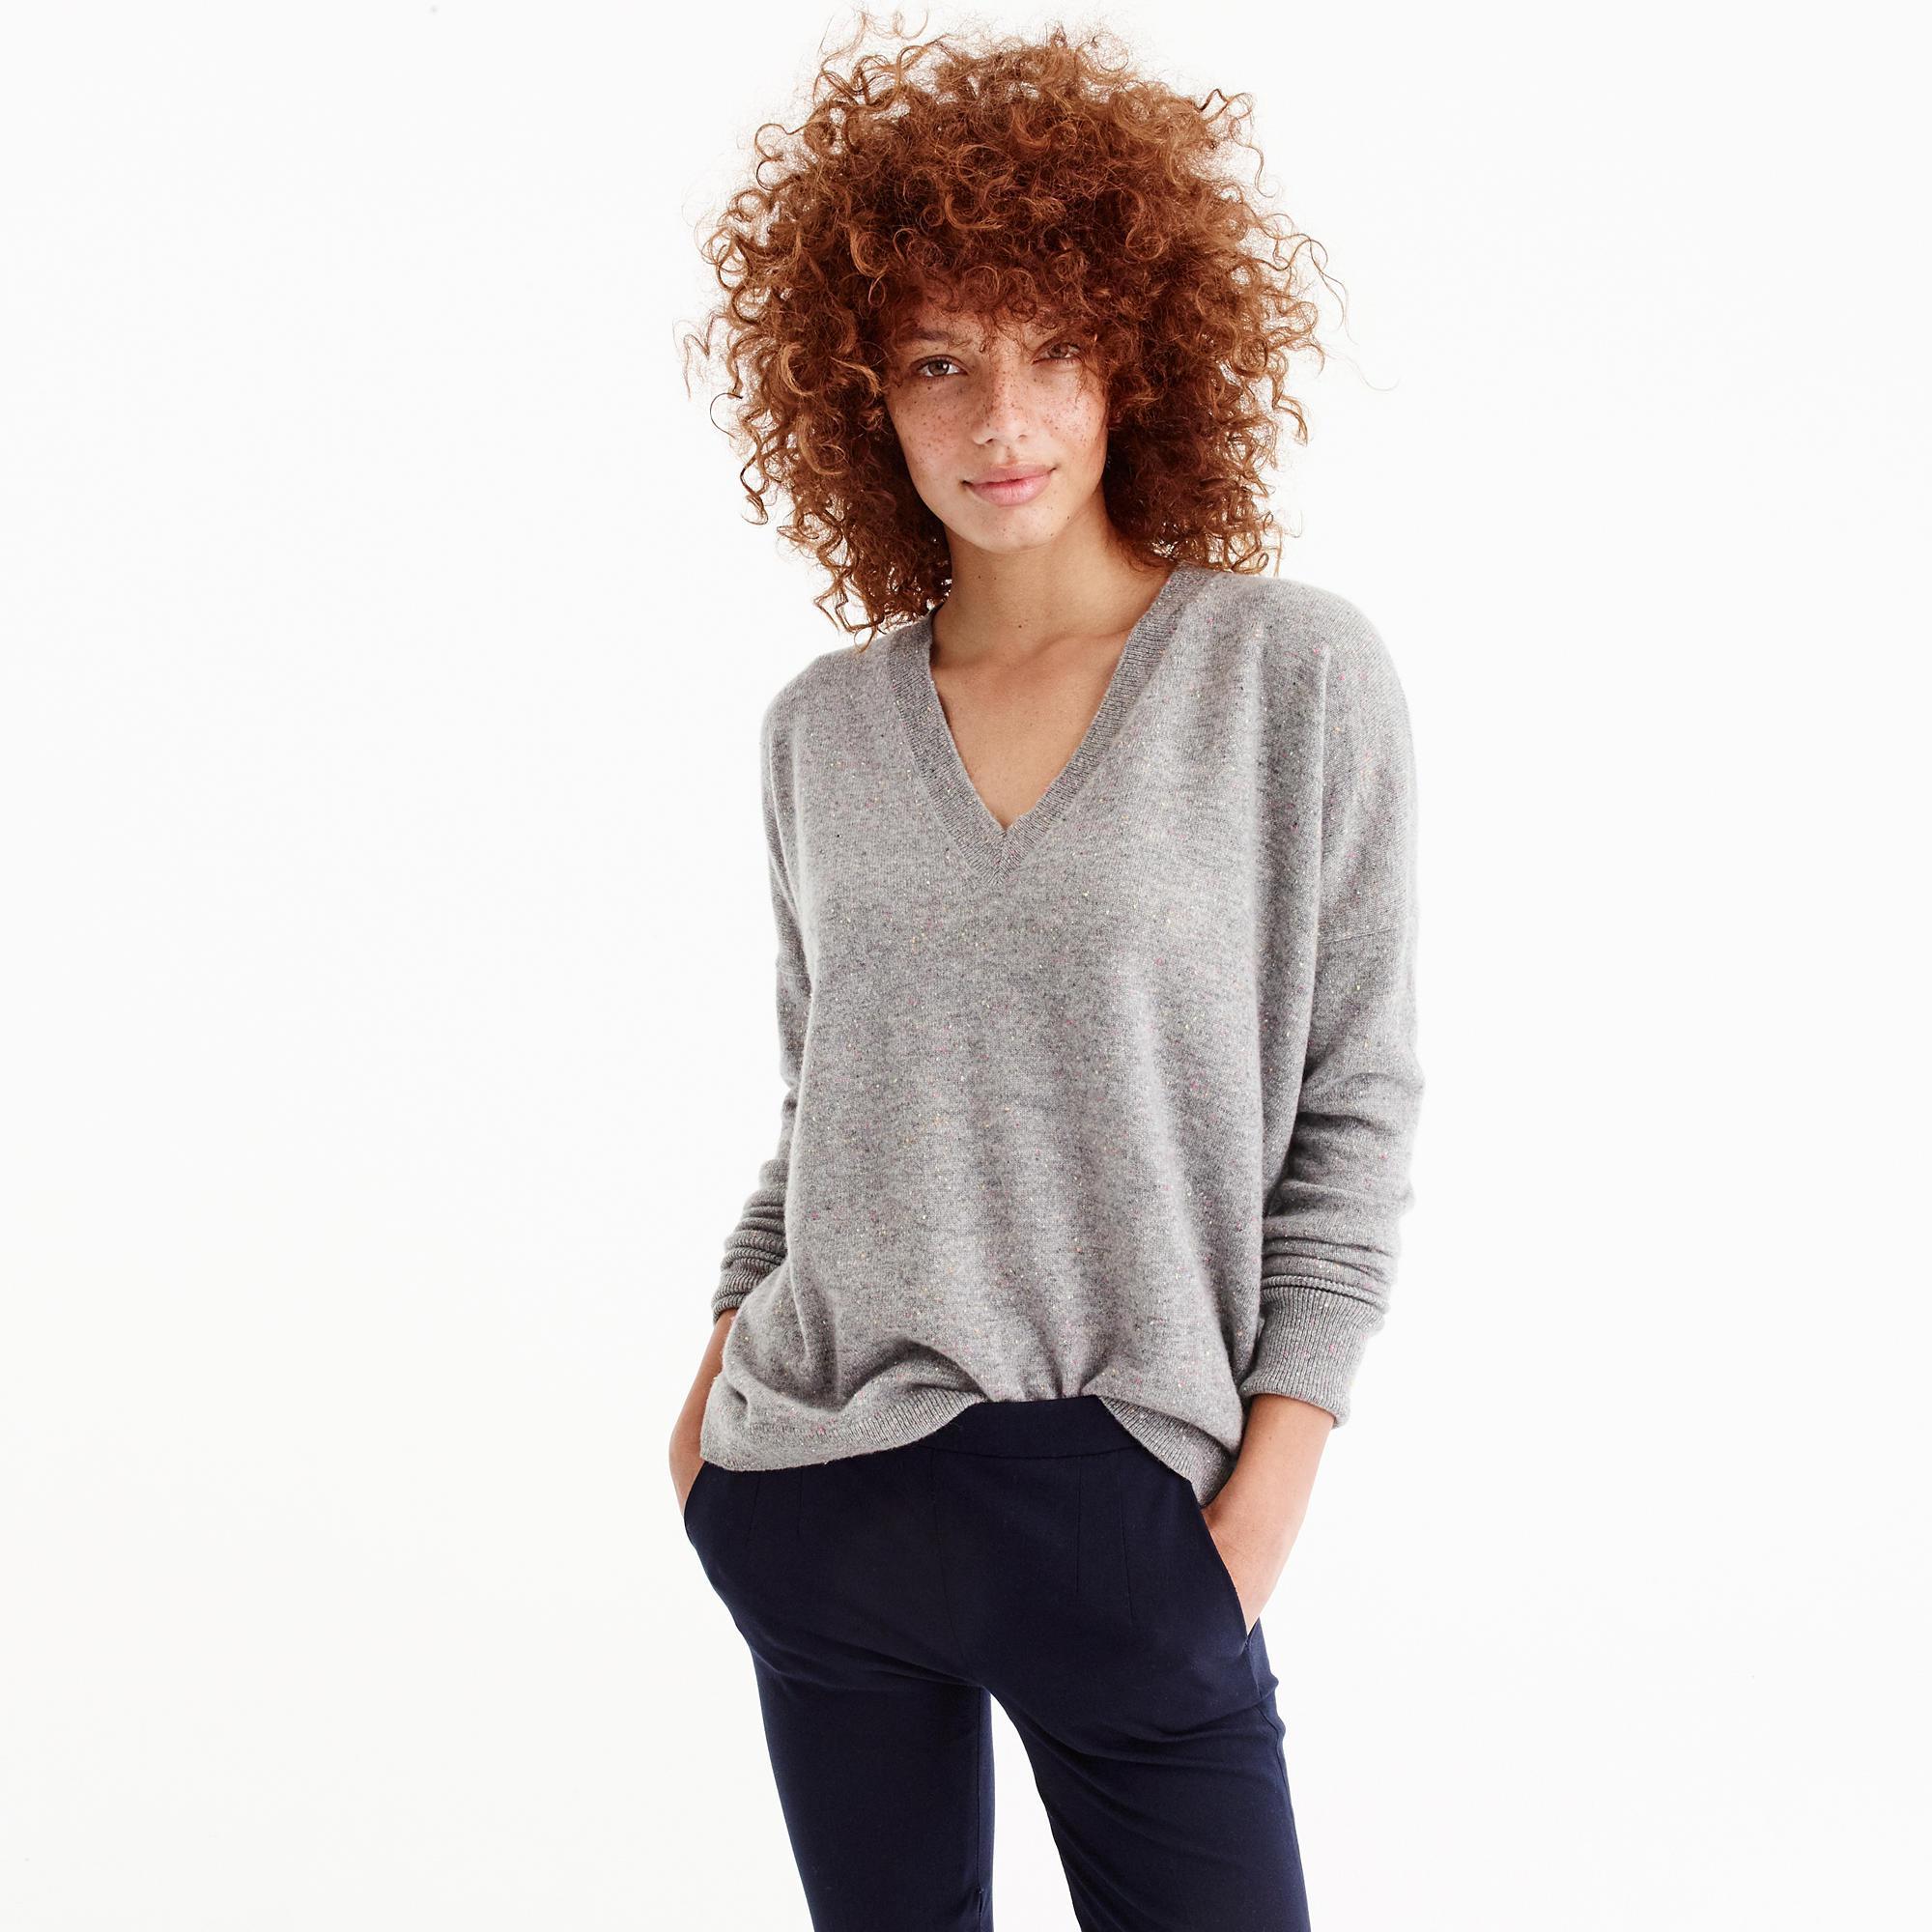 c083a66cbdf6 Lyst - J.Crew V-neck Boyfriend Sweater In Donegal Everyday Cashmere ...